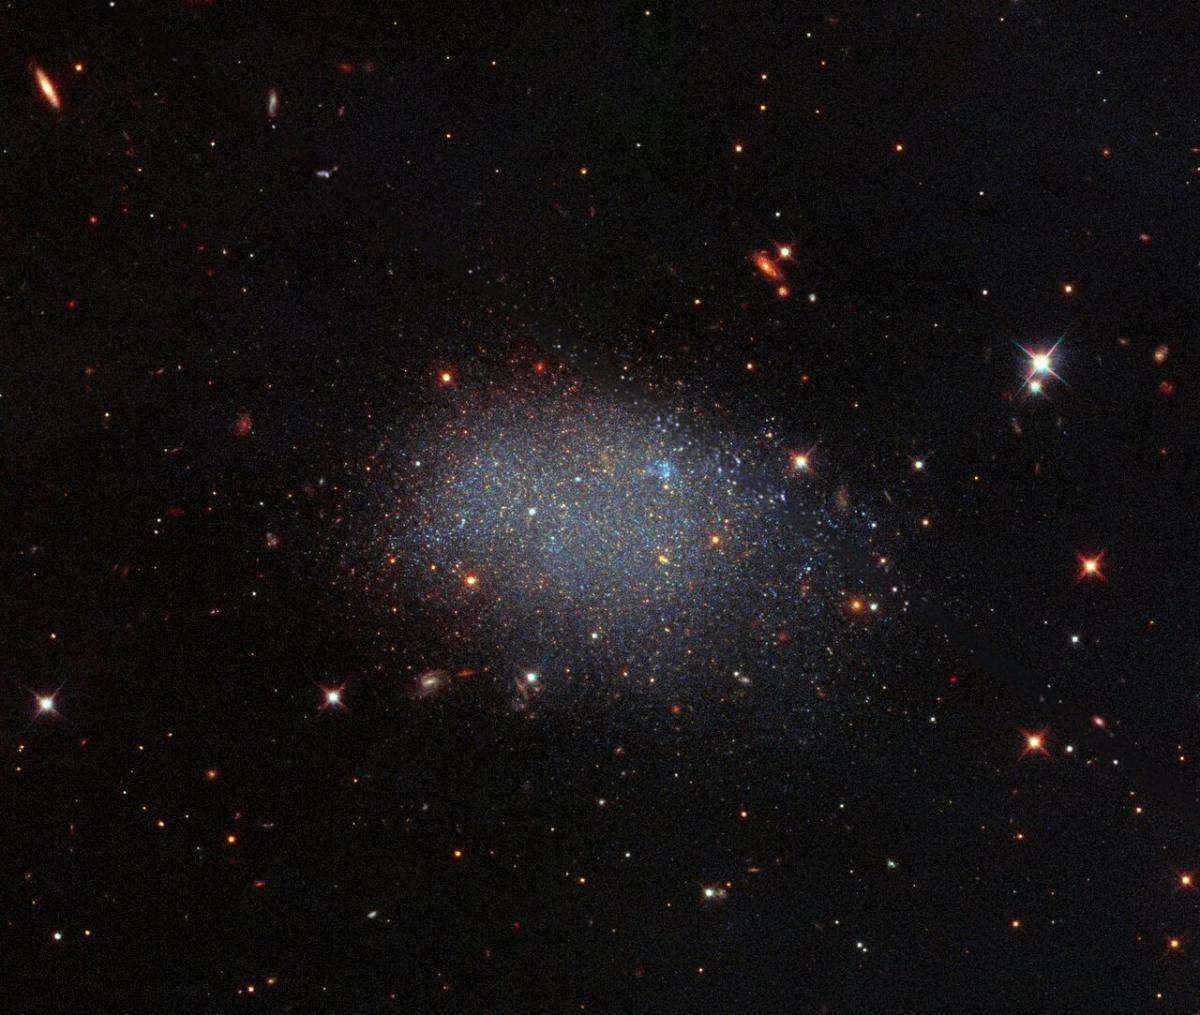 Радиосигналы фиксируют уже в течение определенного времени / Фото ESA/Hubble & NASA, E. Shaya, L. Rizzi, B. Tully et al.